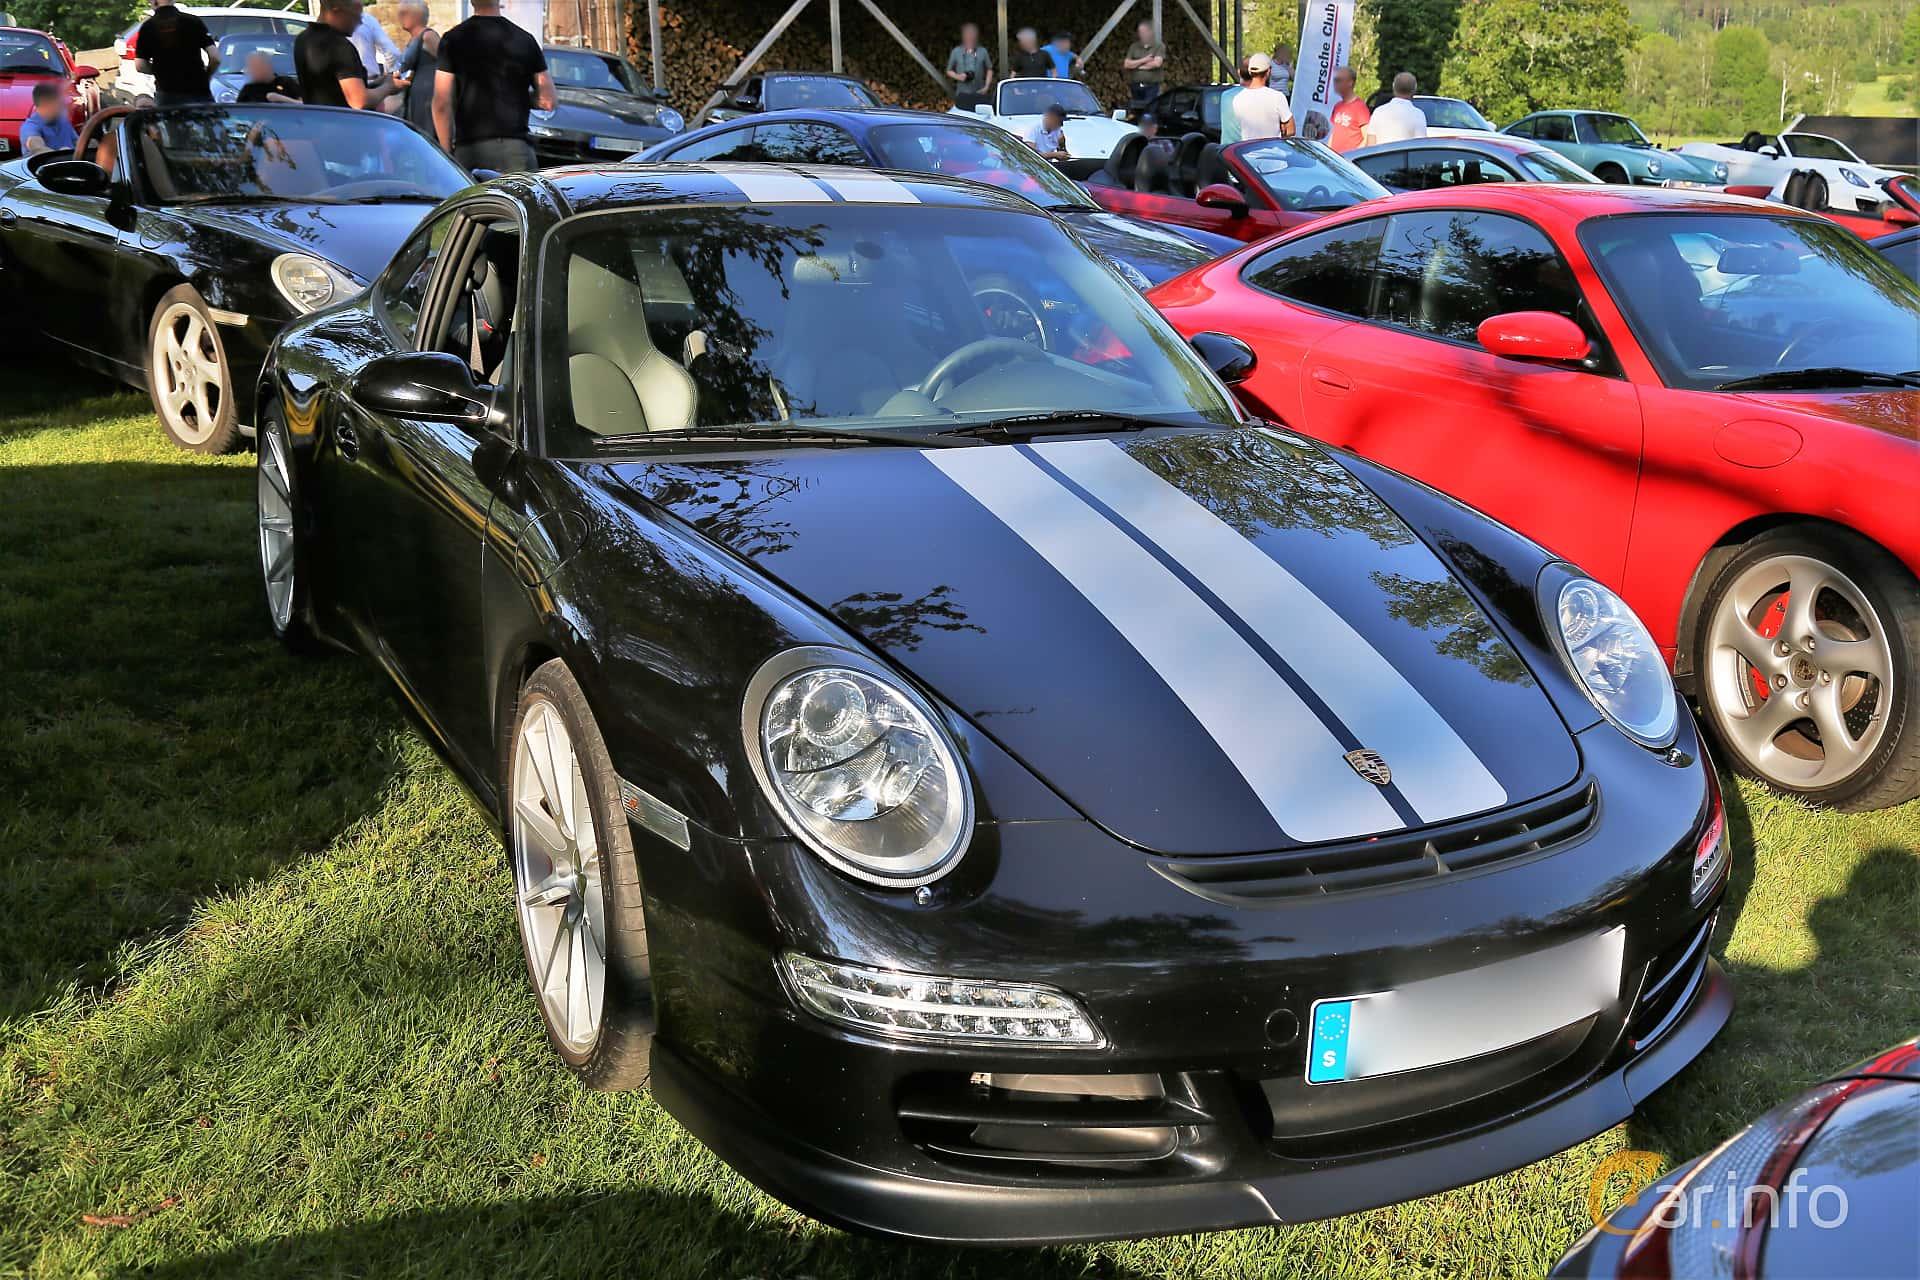 Porsche 911 Carrera S 3.8 H6 Manual, 355hp, 2005 at GMHK Bilträff hos Mellanders 2019